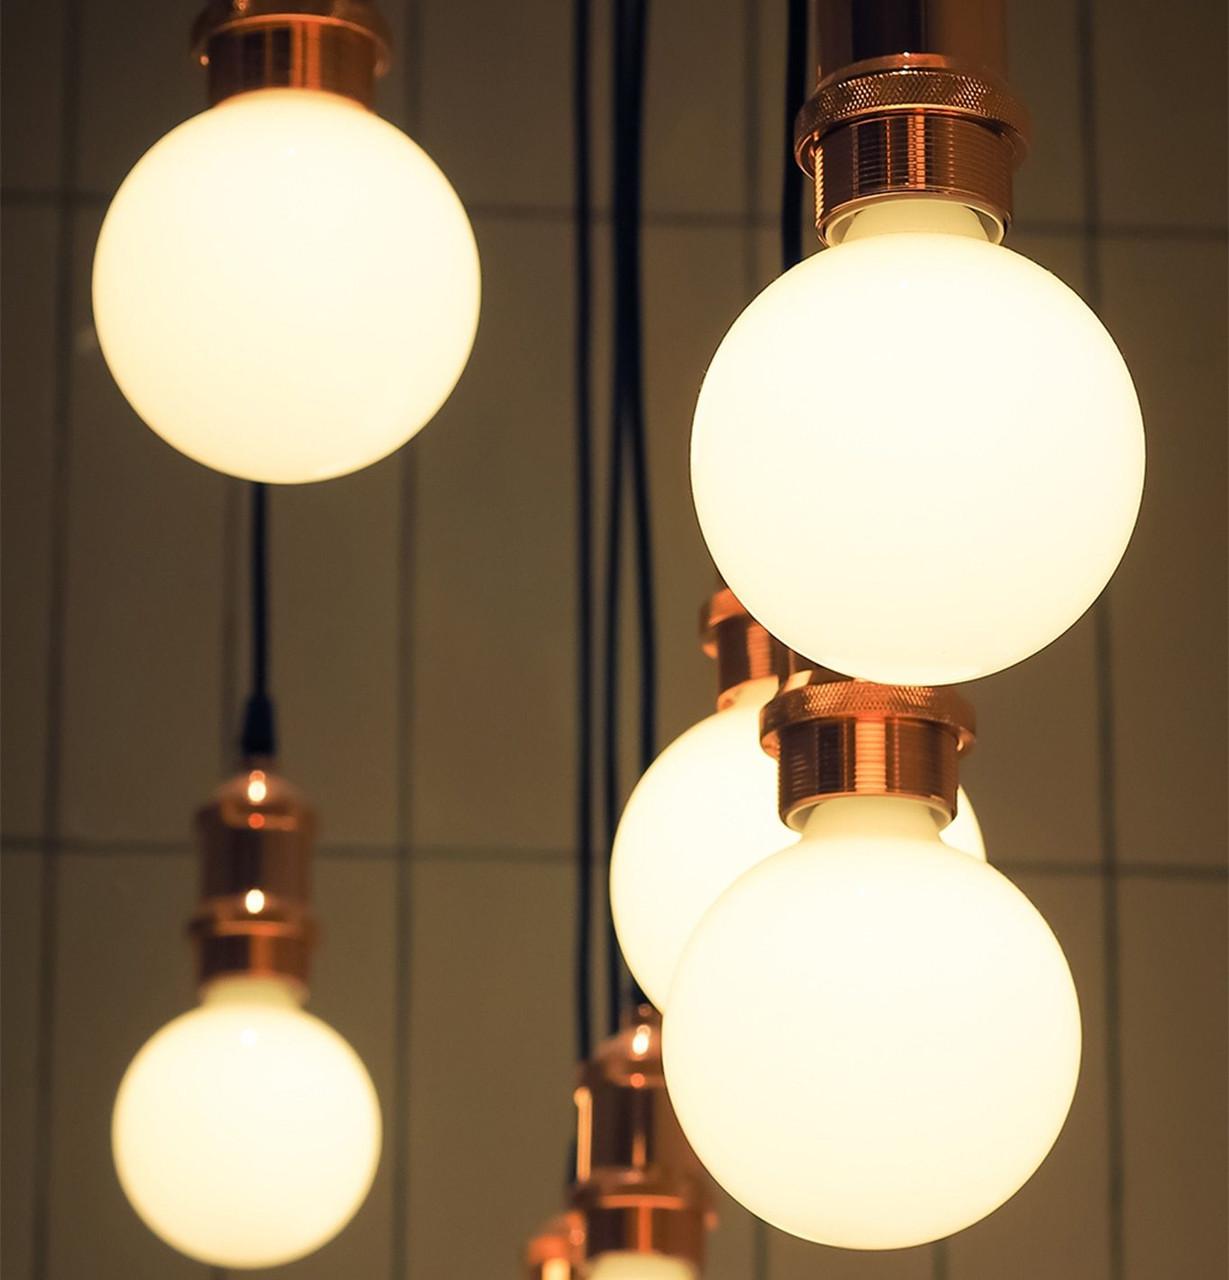 Crompton Lamps LED Globe Edison Light Bulbs